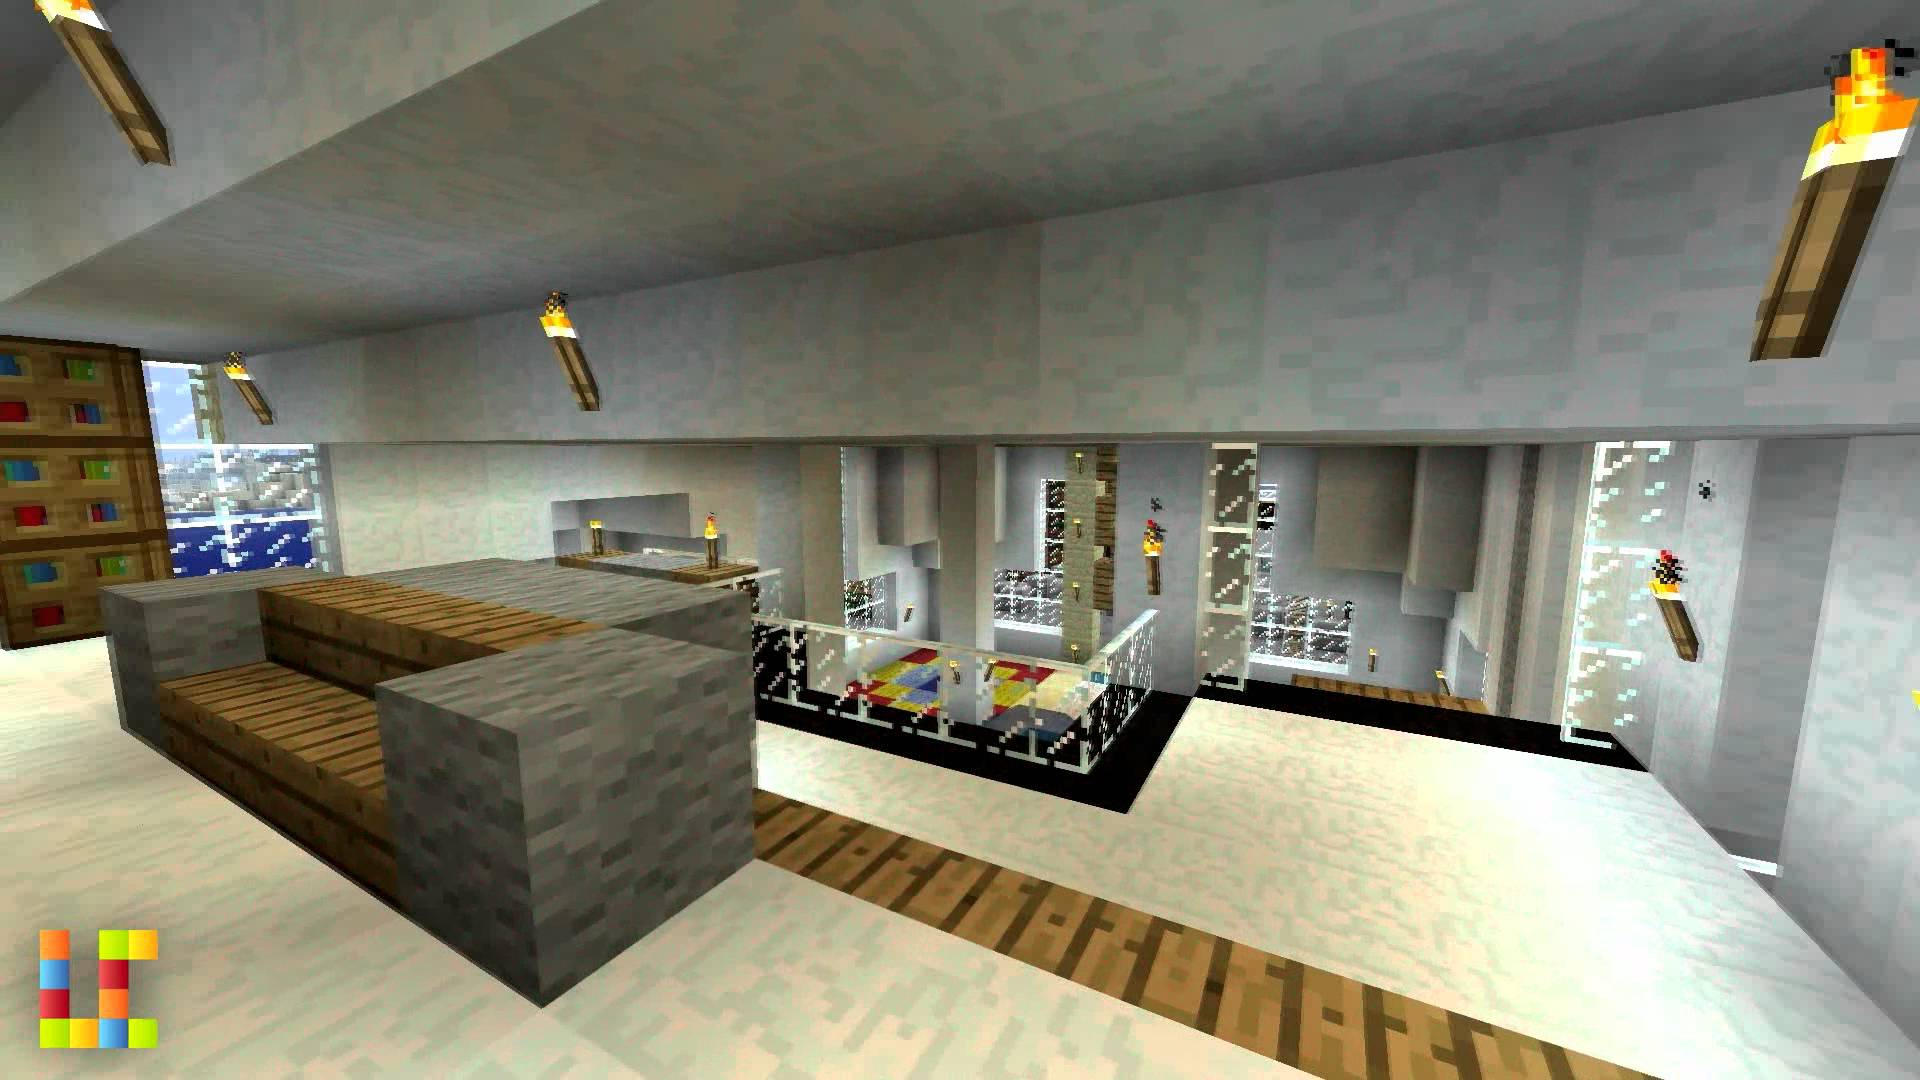 Deco Cuisine Minecraft Unique Photos Deco Chambre Minecraft